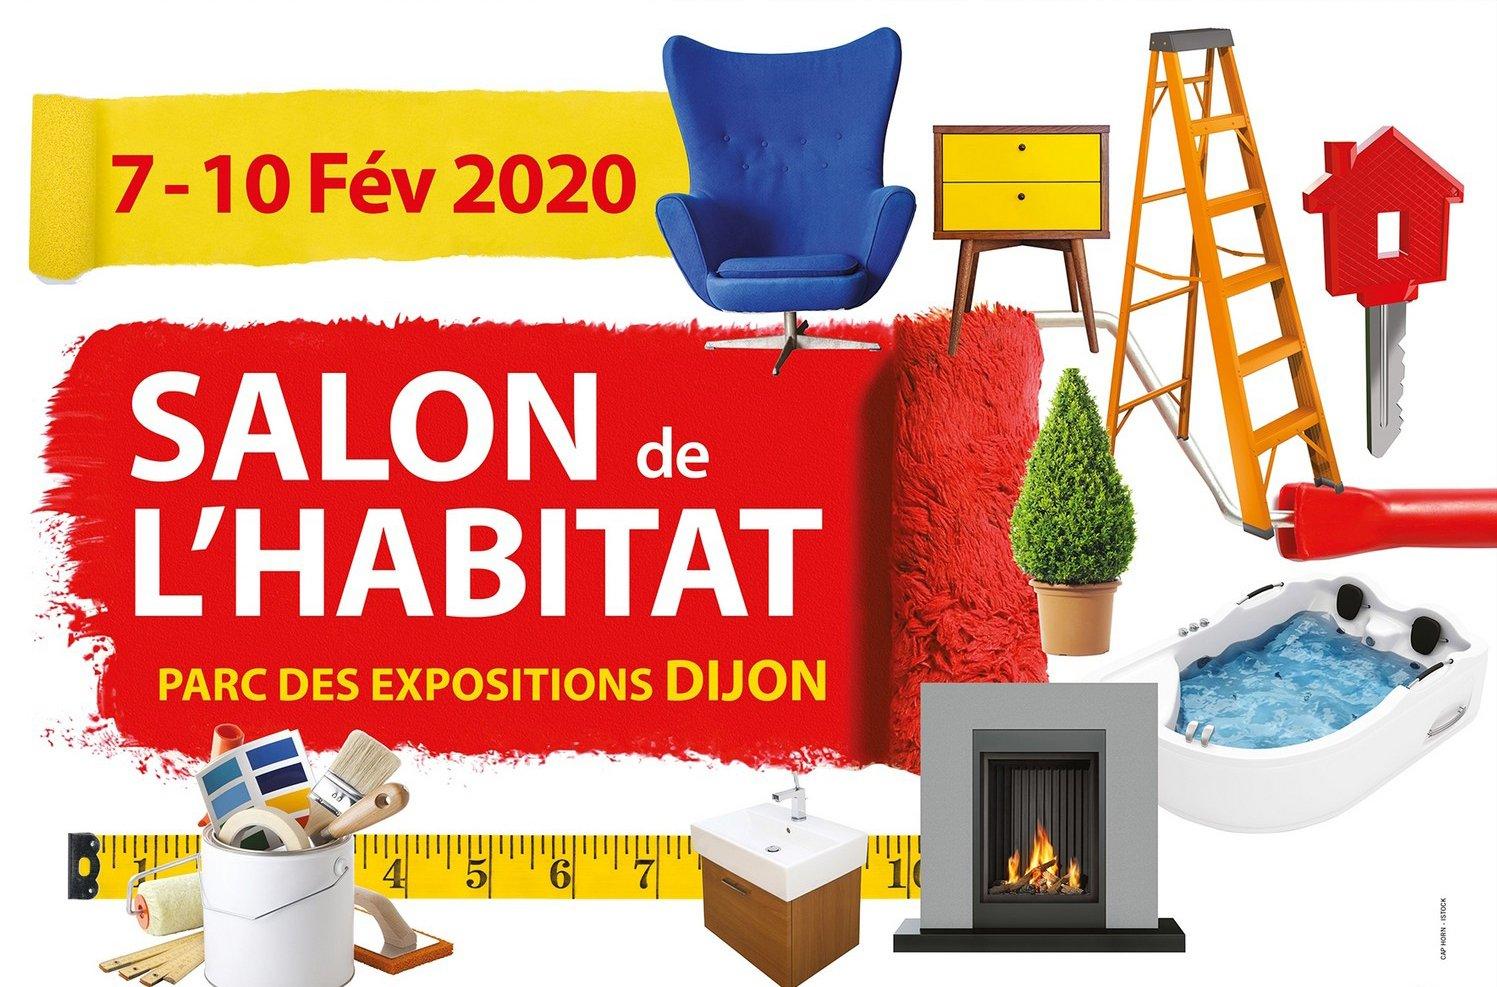 Habitat Meuble De Salle De Bain dijon : salon de l'habitat du 7 au 10 février 2020 - infos dijon